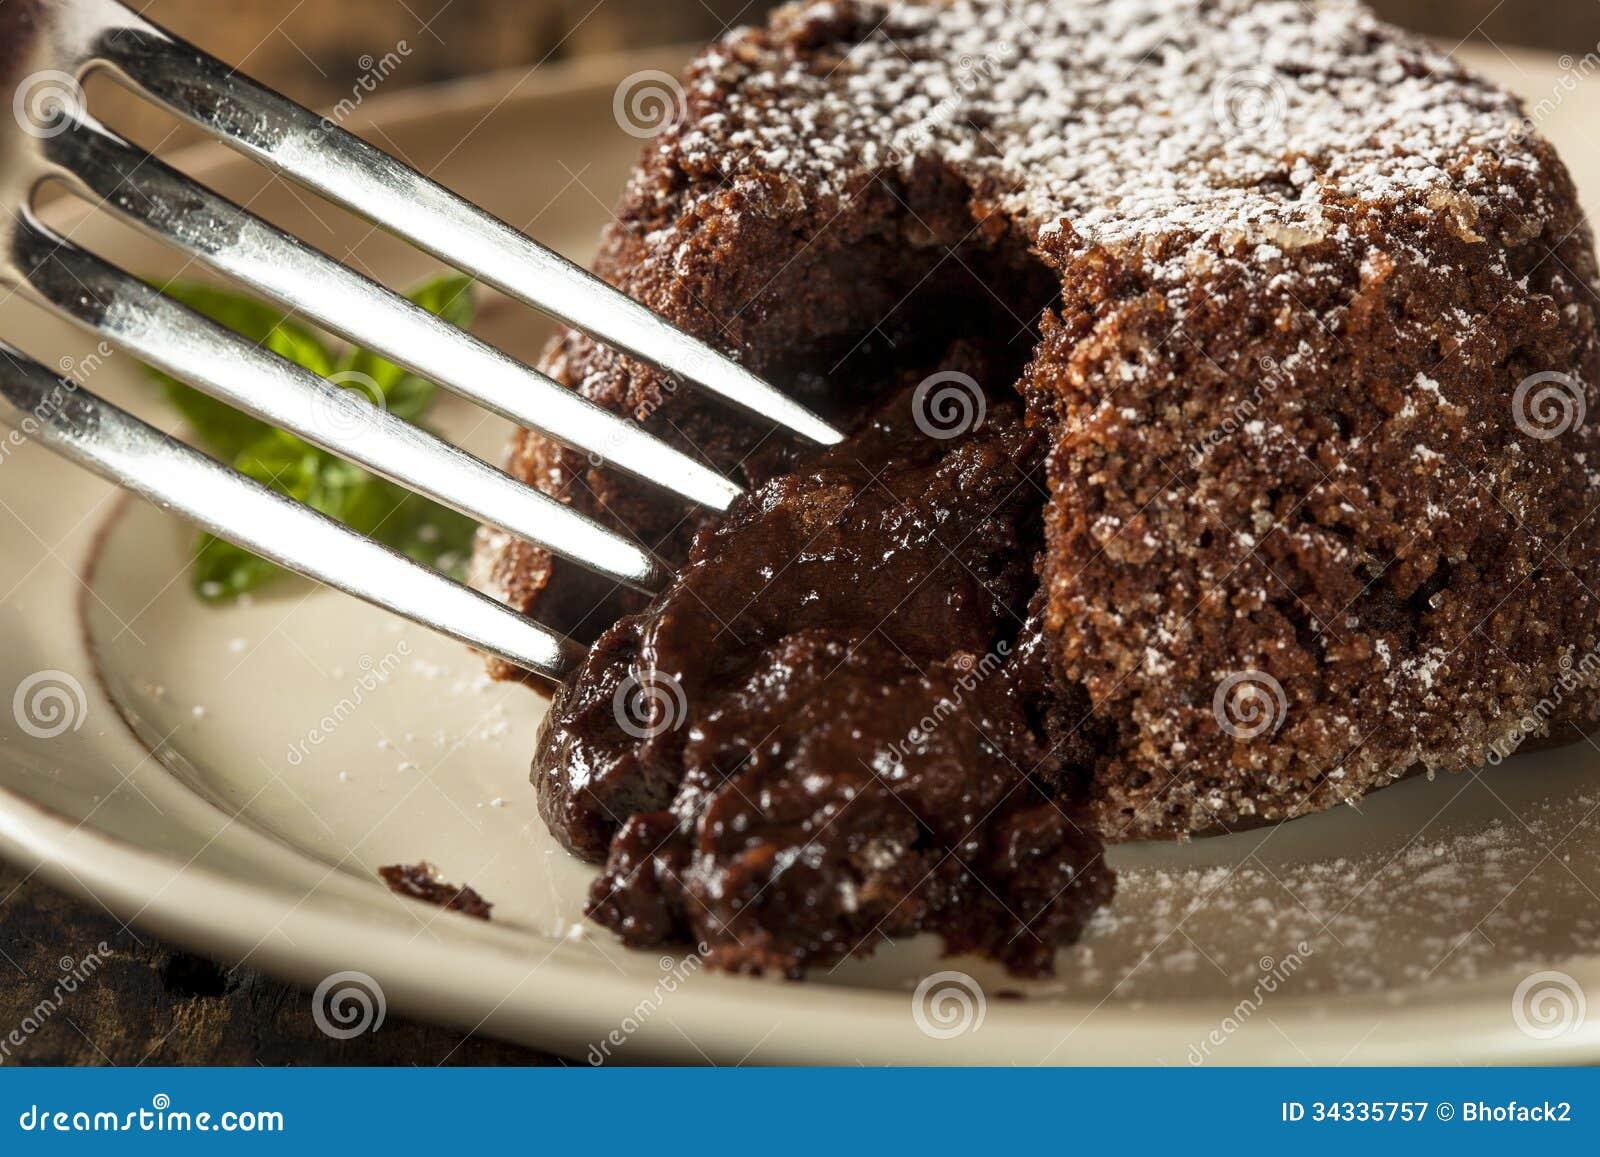 Chocolate Cake Images Dessert : Homemade Chocolate Lava Cake Dessert Royalty Free Stock ...